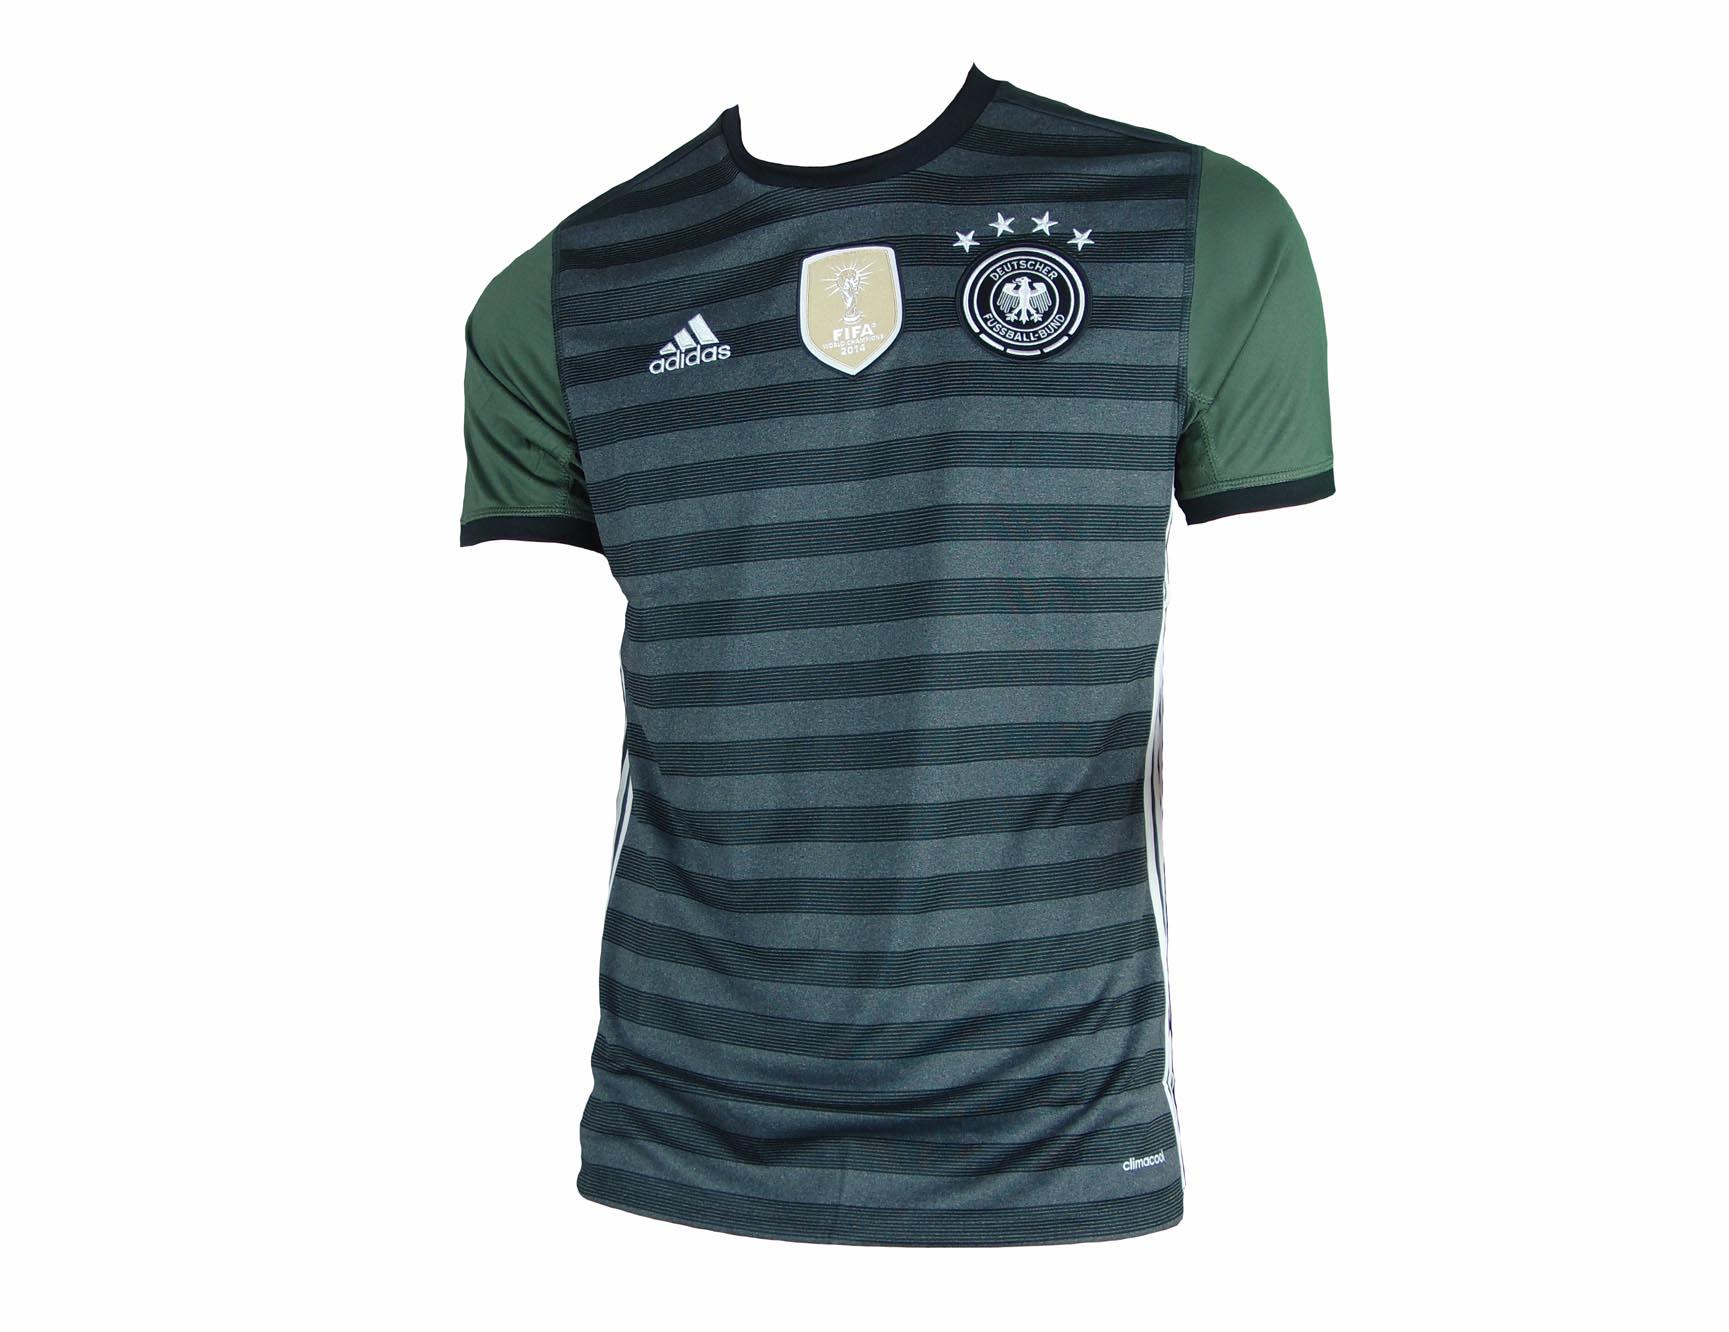 Deutschland Dfb Trikot Away Adidas 2016 Kindergröß House Of Shirts